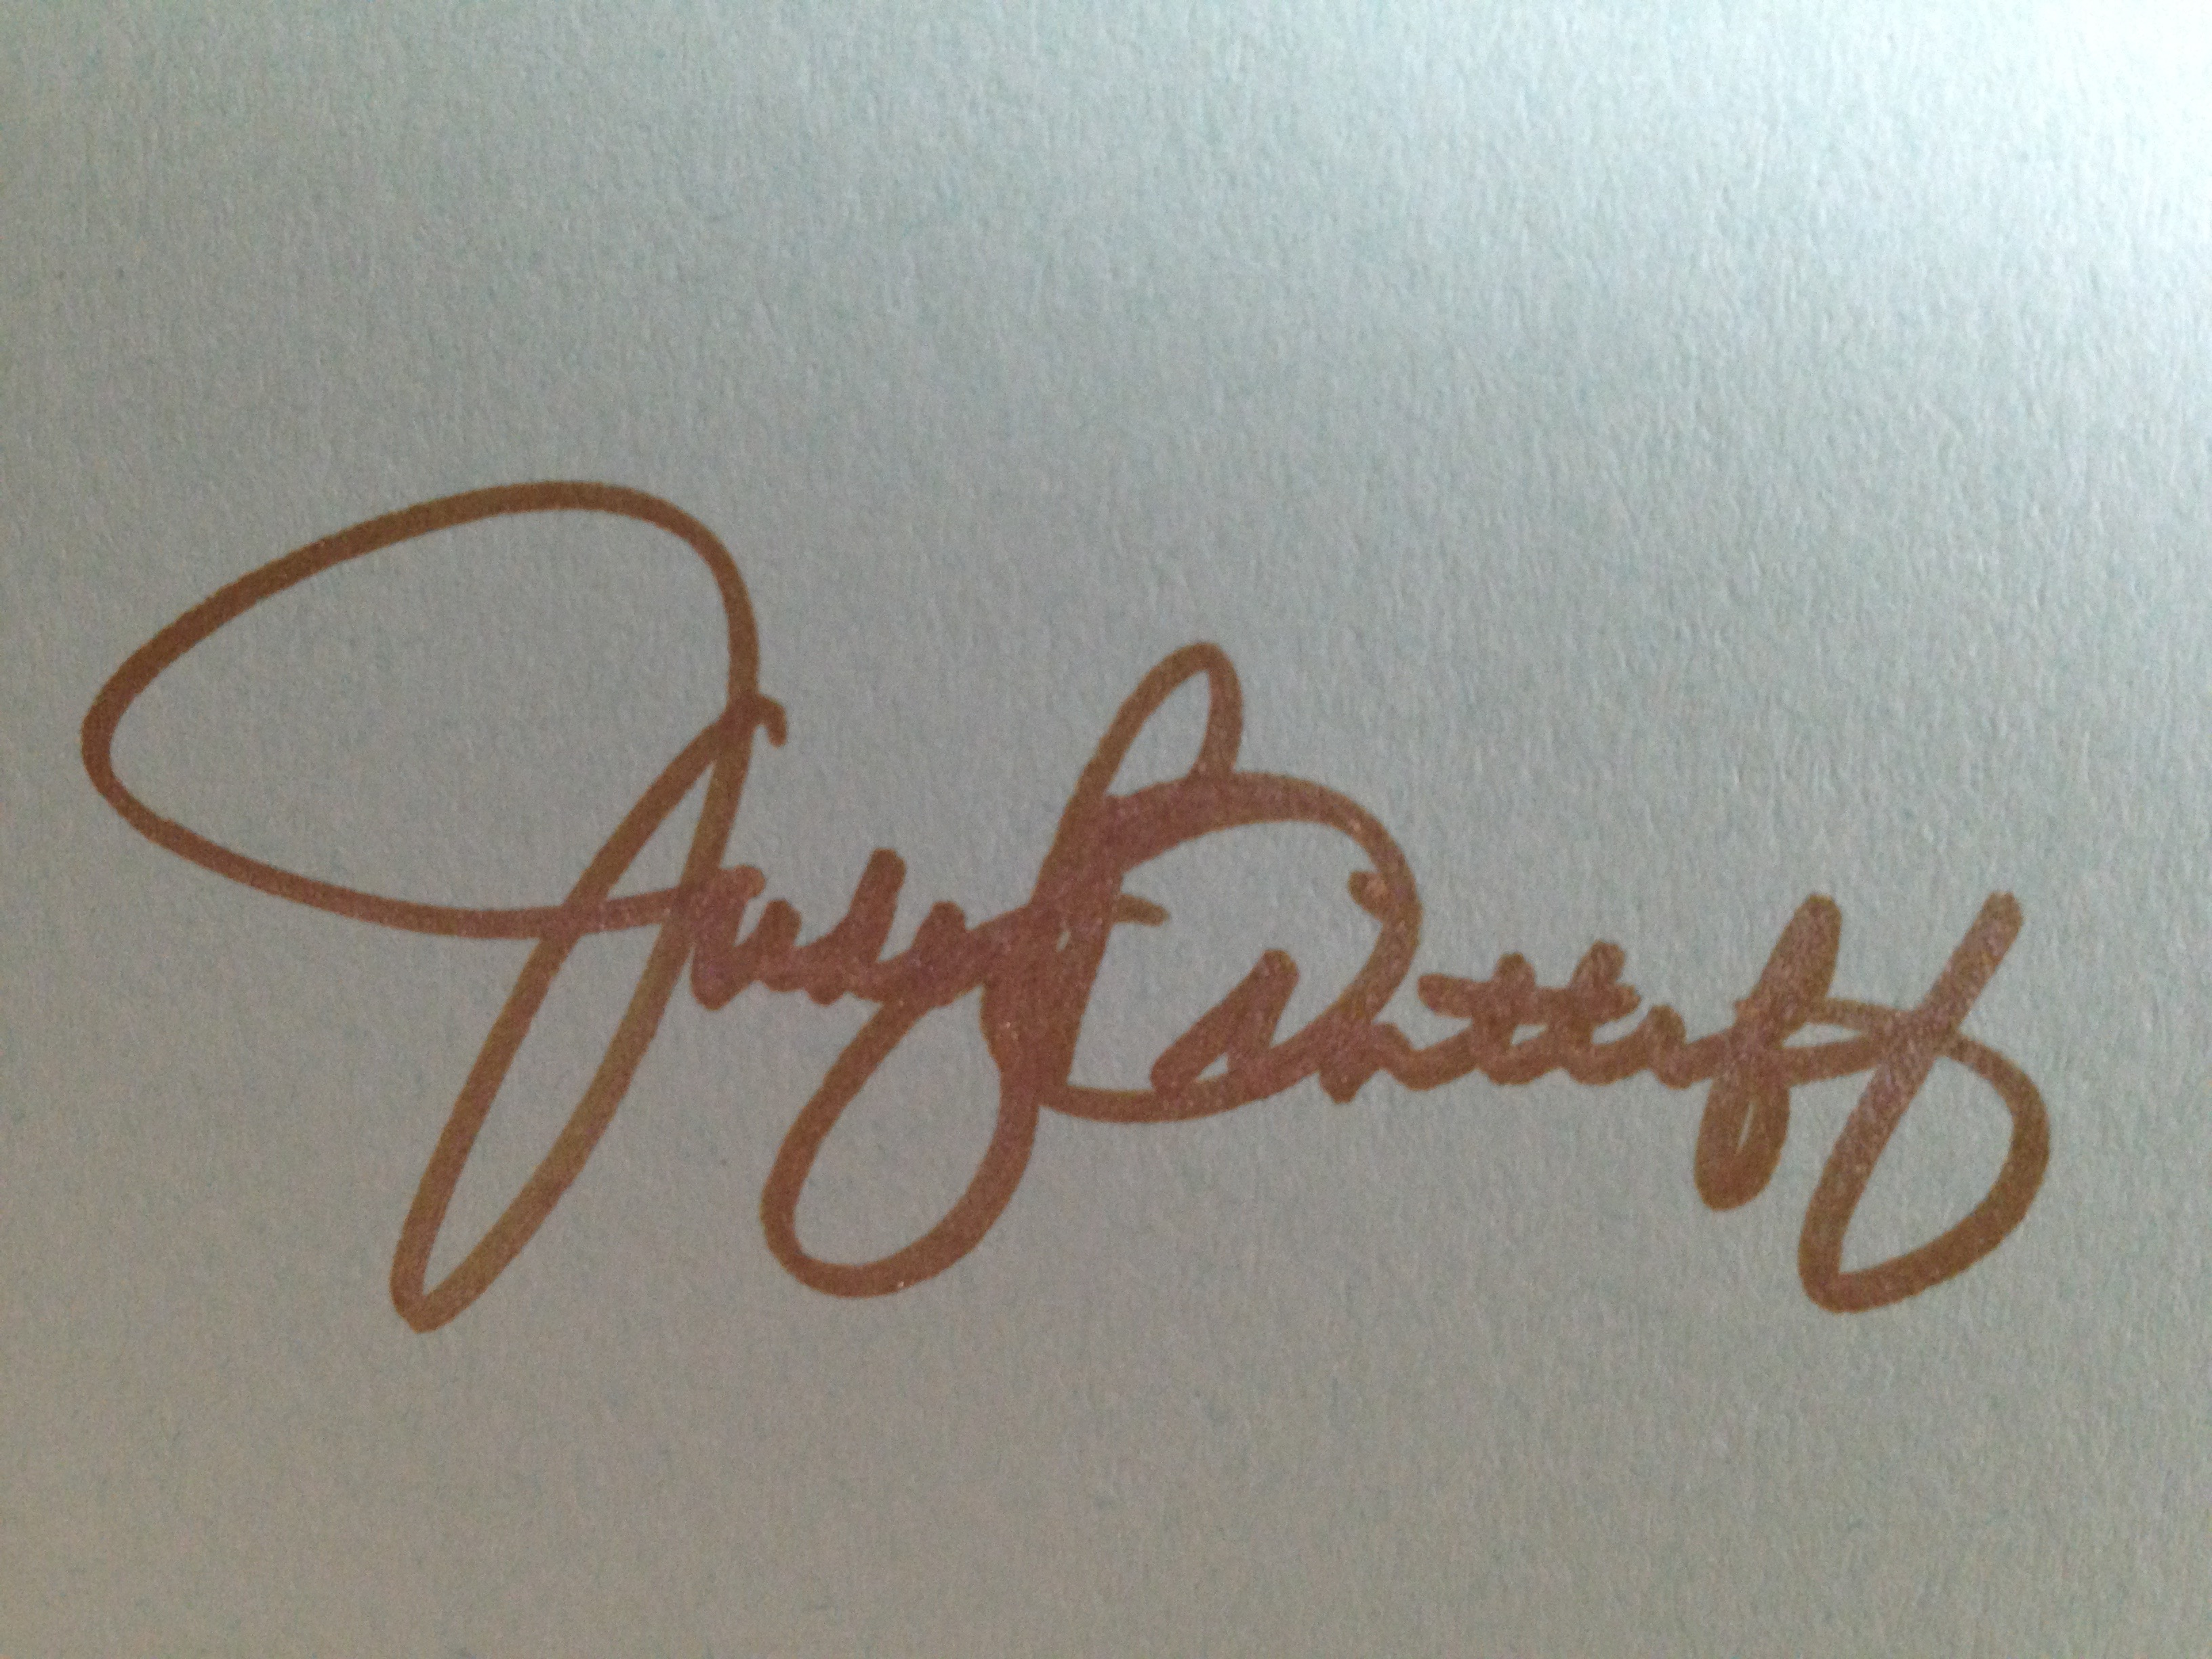 Judy Bintliff Signature